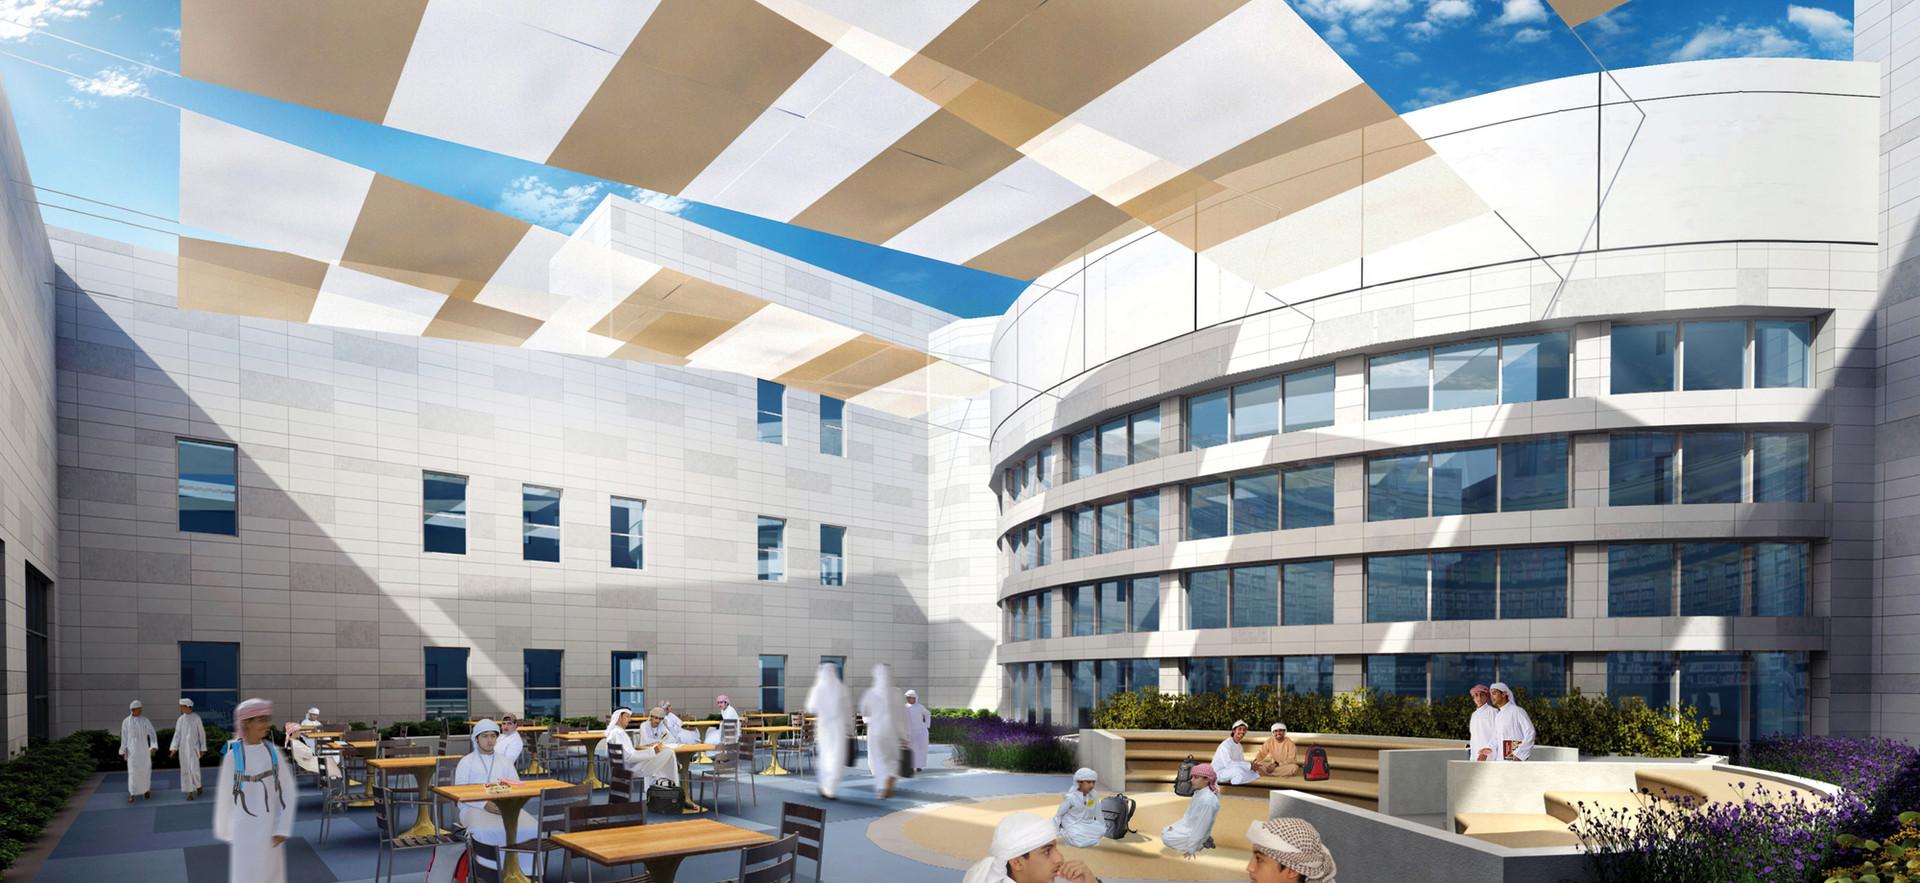 ADEC Future School, Abu Dhabi, UAE